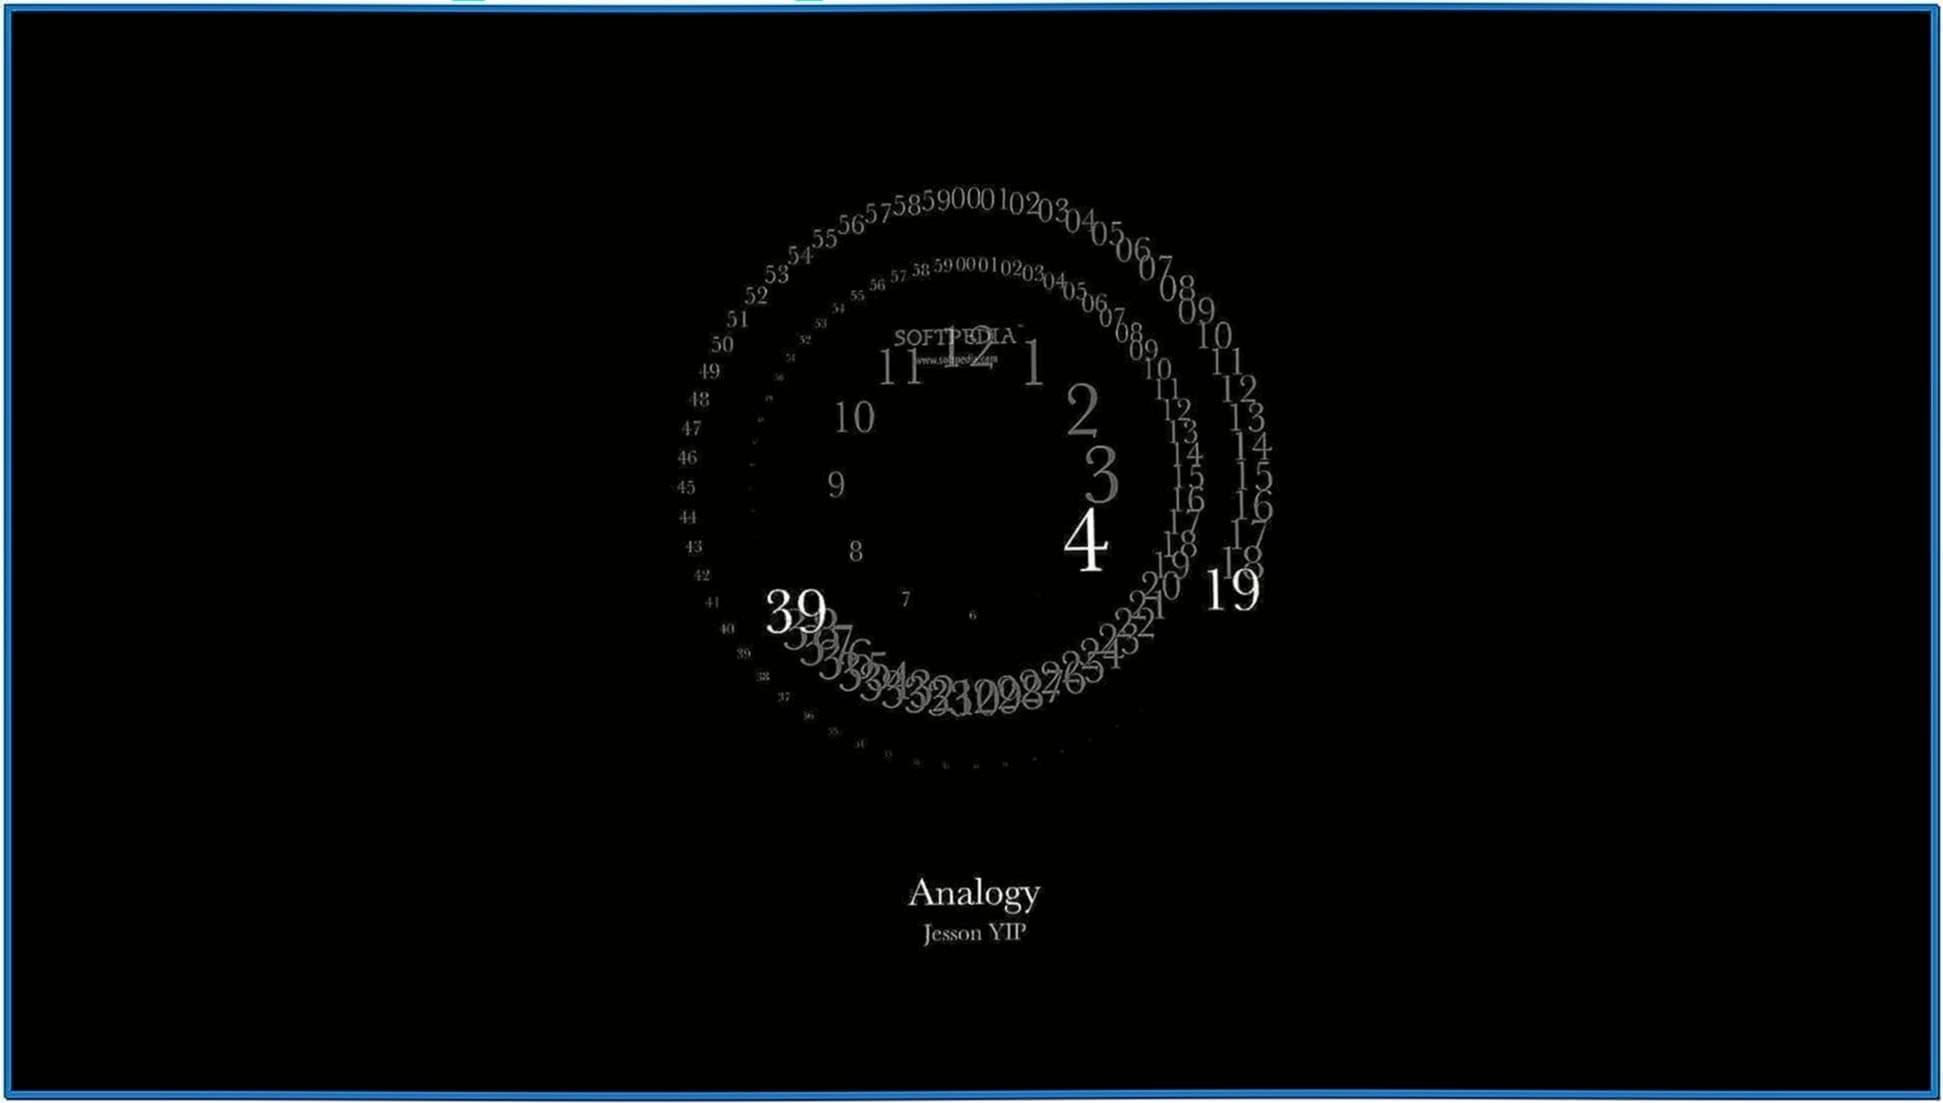 Analogy Mac screensaver